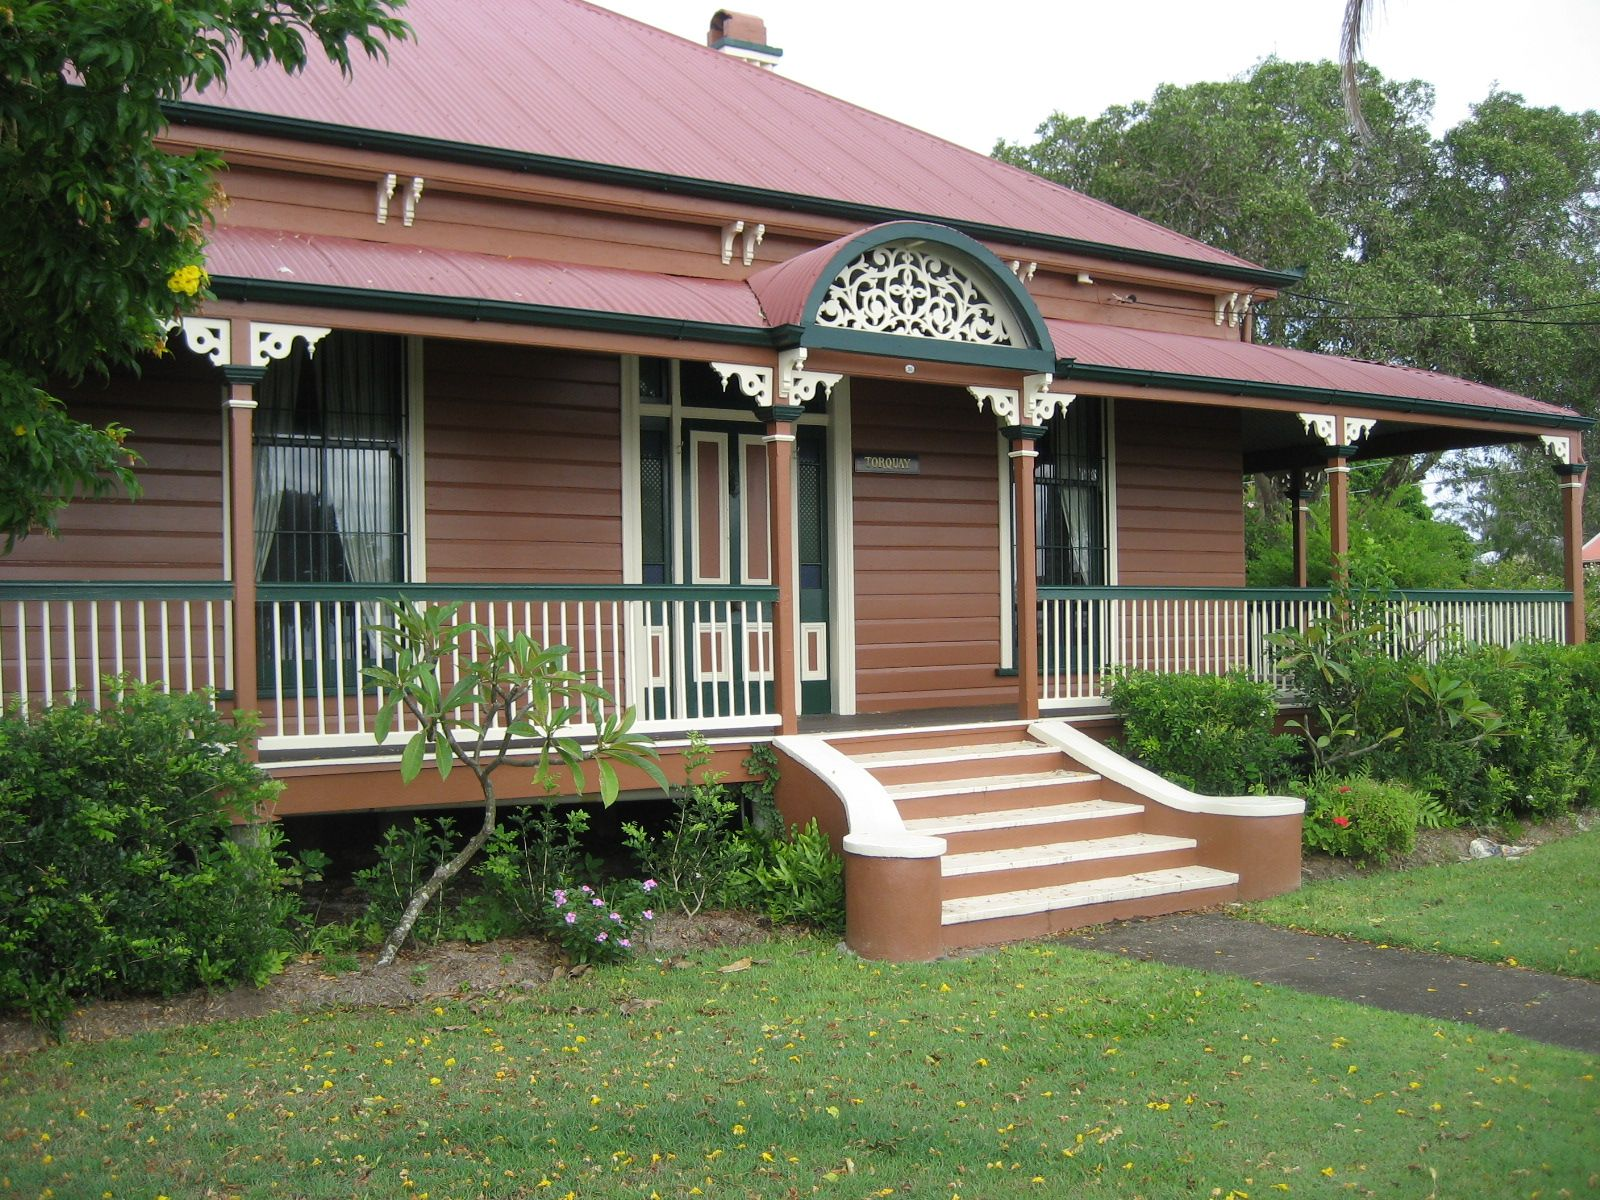 Australian queenslander home with wide verandahs to escape for Queenslander home designs australia